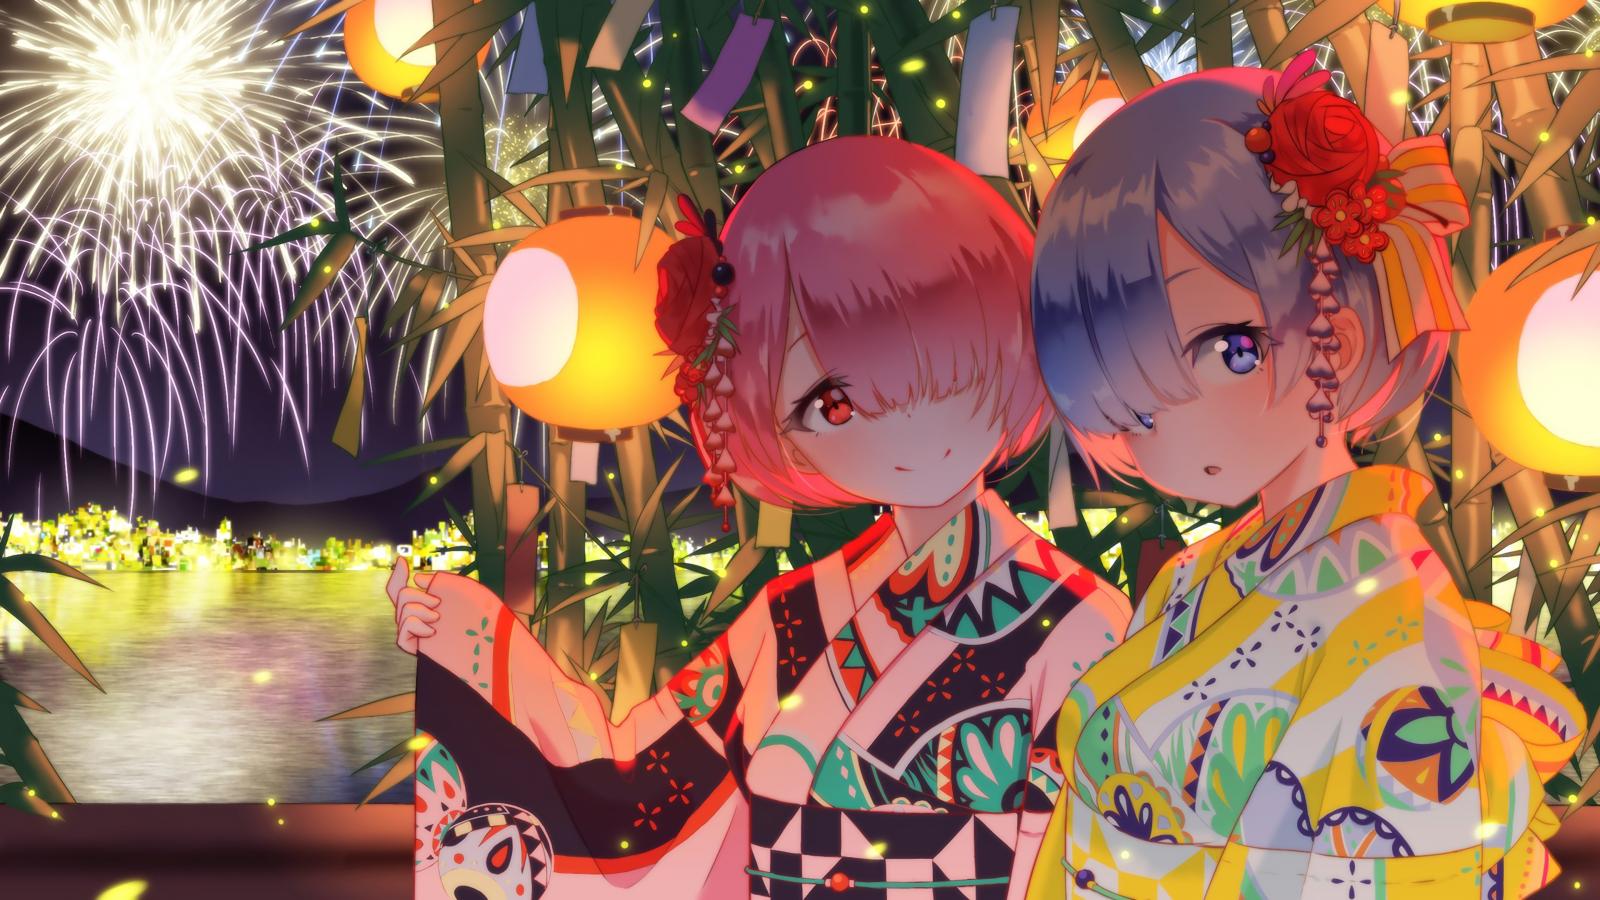 Anime Chicas anime Movimiento rápido del ojo Rem Re Zero Ram re zero fuegos artificiales Yukata Cero Re Zero Kara Hajimeru Isekai Seikatsu cabello rosado pelo azul Arte japonés Gemelos arte de fan